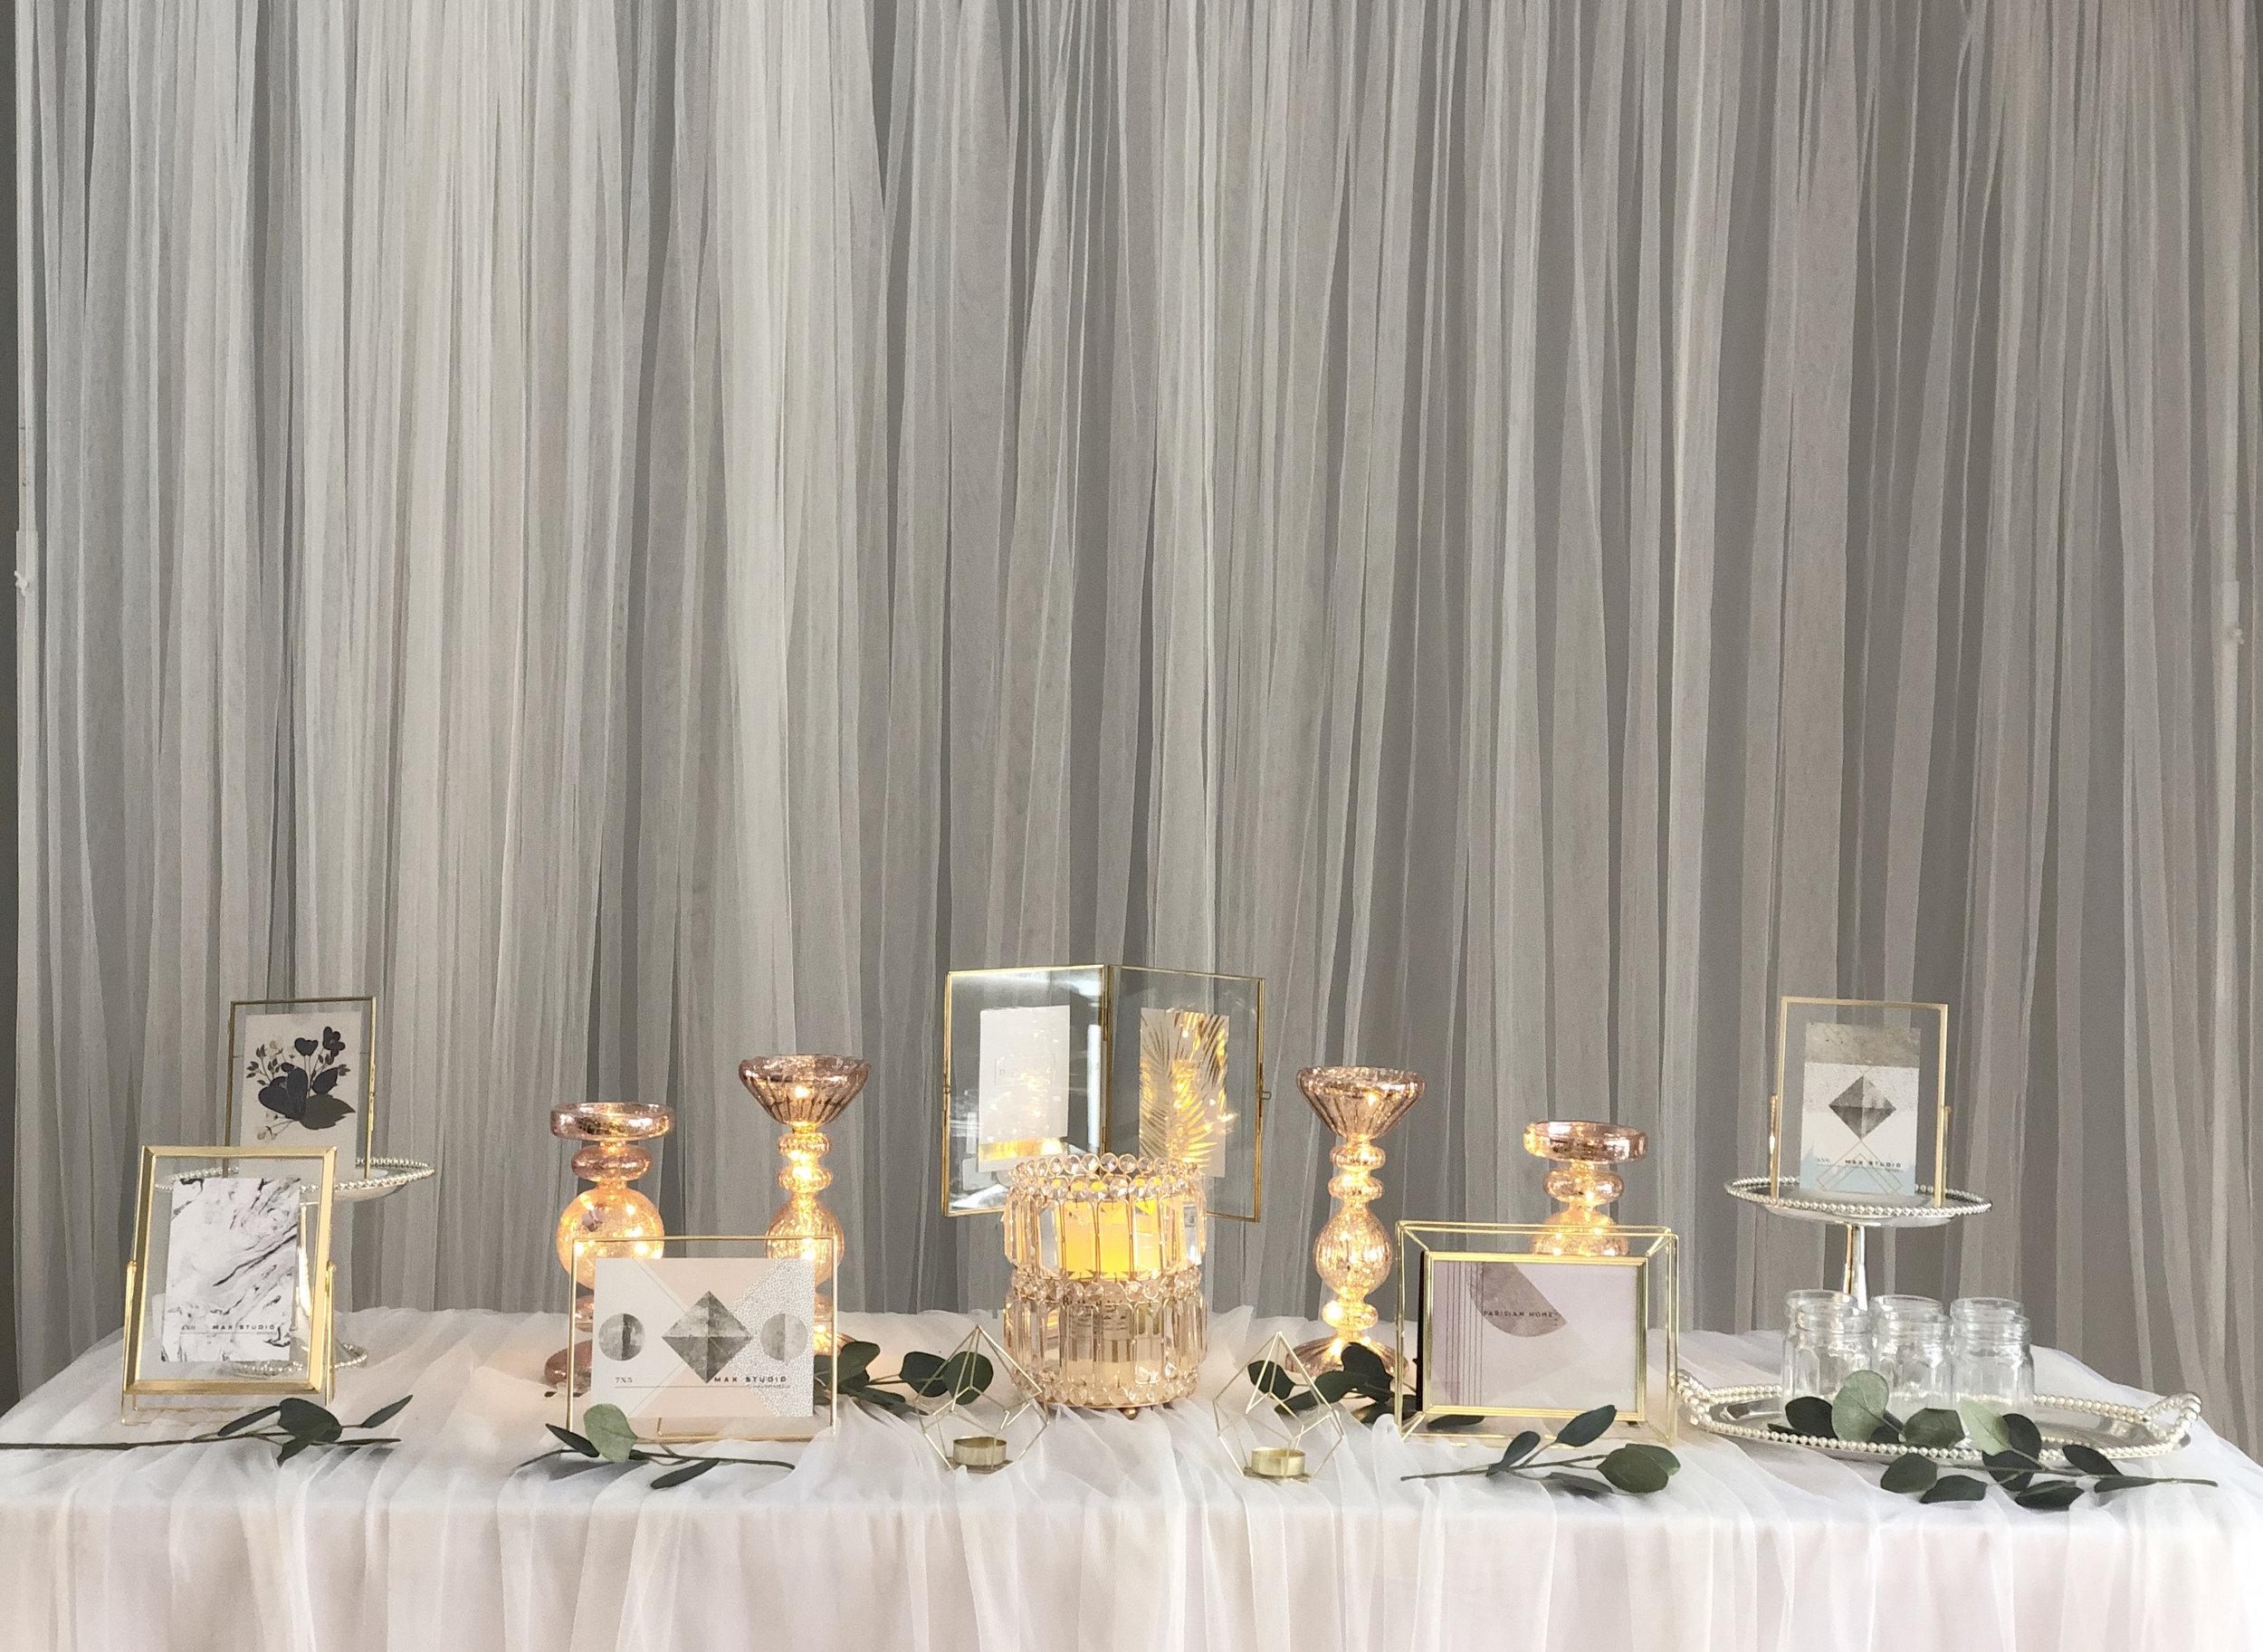 little castle photo table - Included: 6 picture frames, 2 mini gold candle holders, 4 rose gold candle holders, 1 rose gold crystal candle holder, 2 frame stands, 6 doljabi glass jars, sliver tray.상품 구성: 액자 6개, 미니 골드 캔들 홀더 2개, 로즈골드 캔들 홀더 4개, 로즈골드 크리스탈 캔들 홀더 1개, 액자 스탠드 2개, 돌잡이 통 6개, 실버 접시.